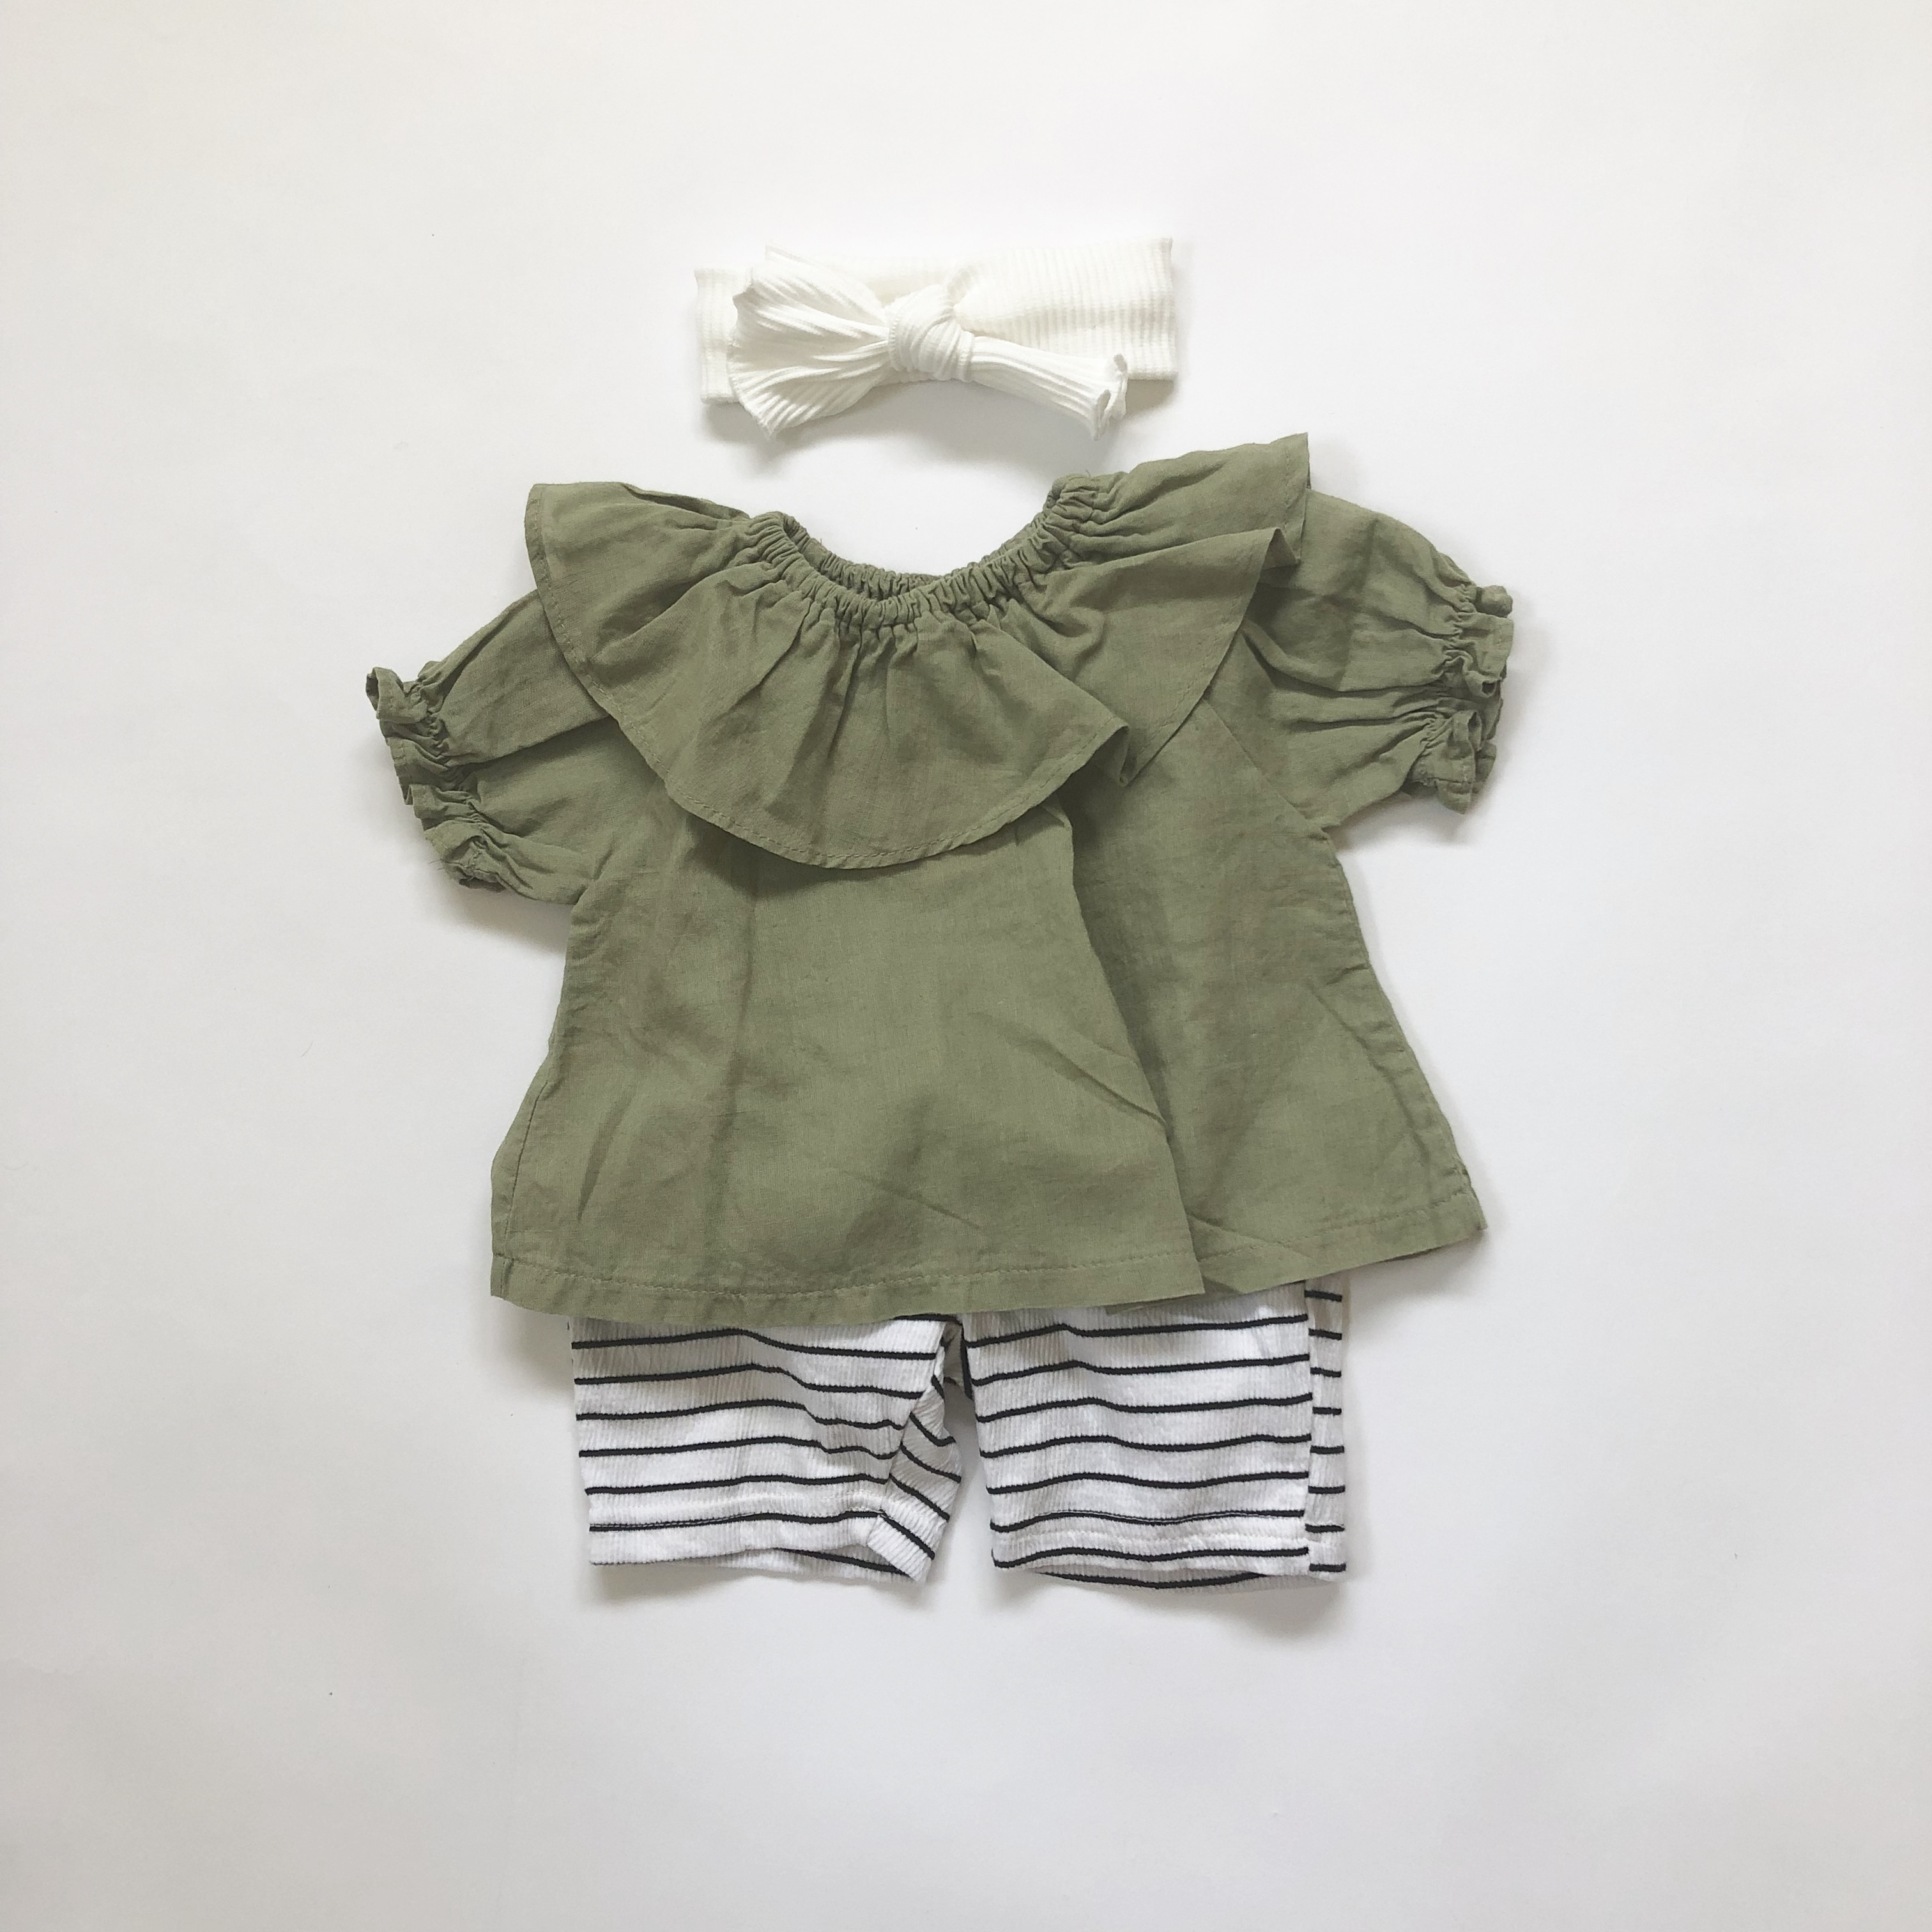 〈 210 〉Lilo frill shirt